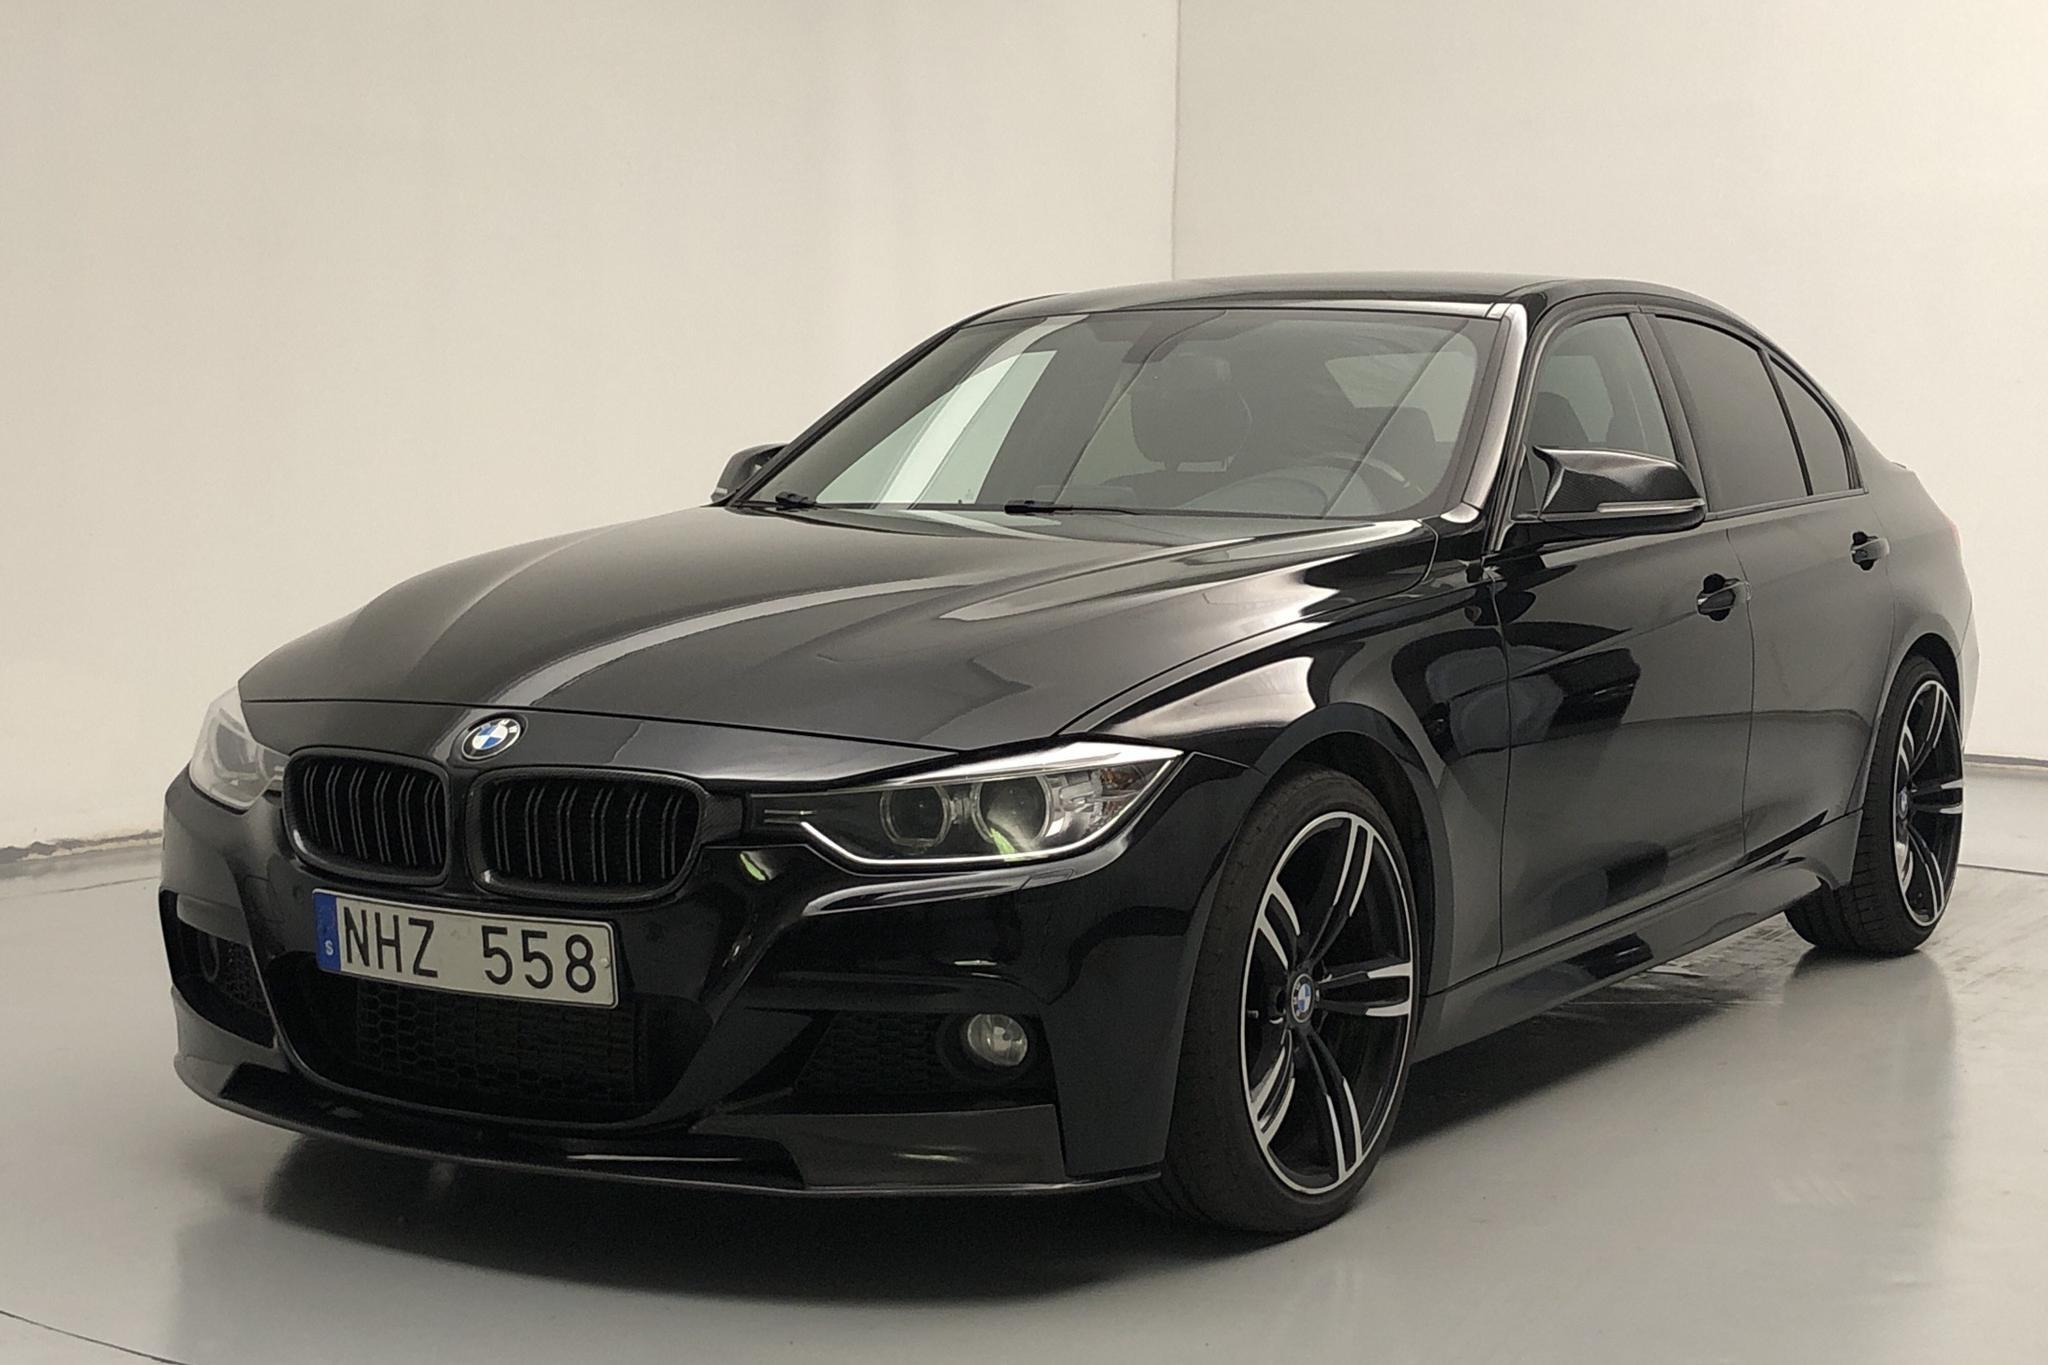 BMW 328i Sedan, F30 (245hk)